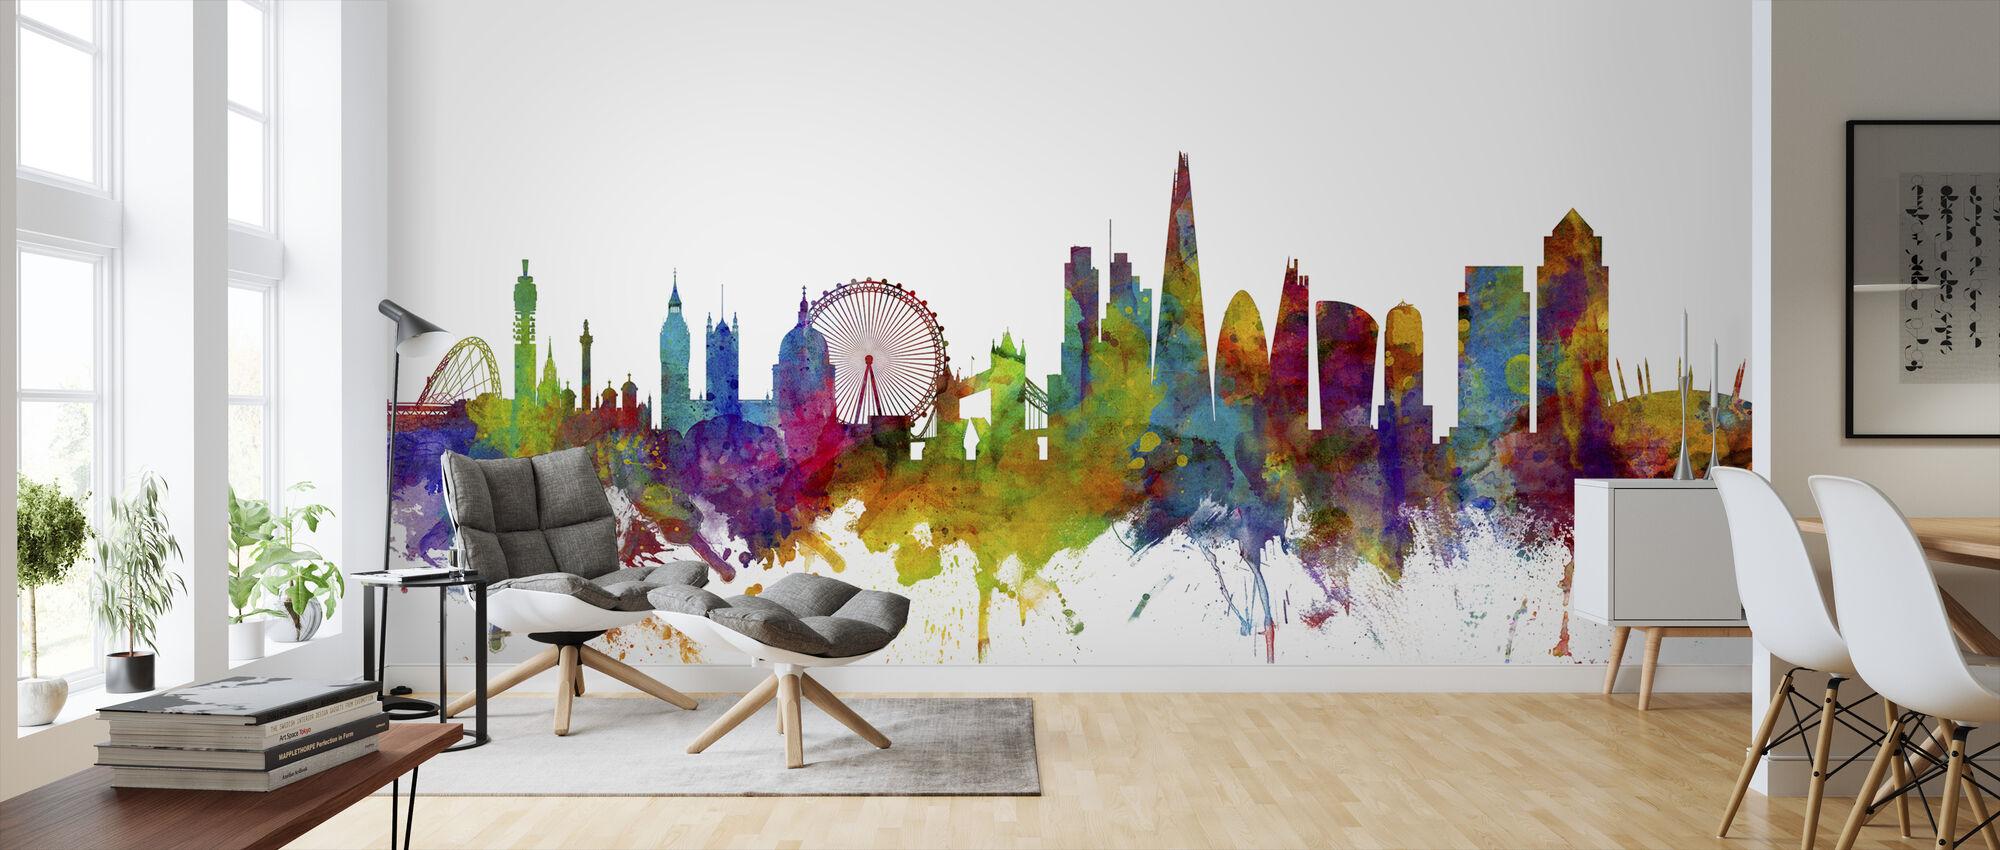 London Canary Wharf skyline - Wallpaper - Living Room